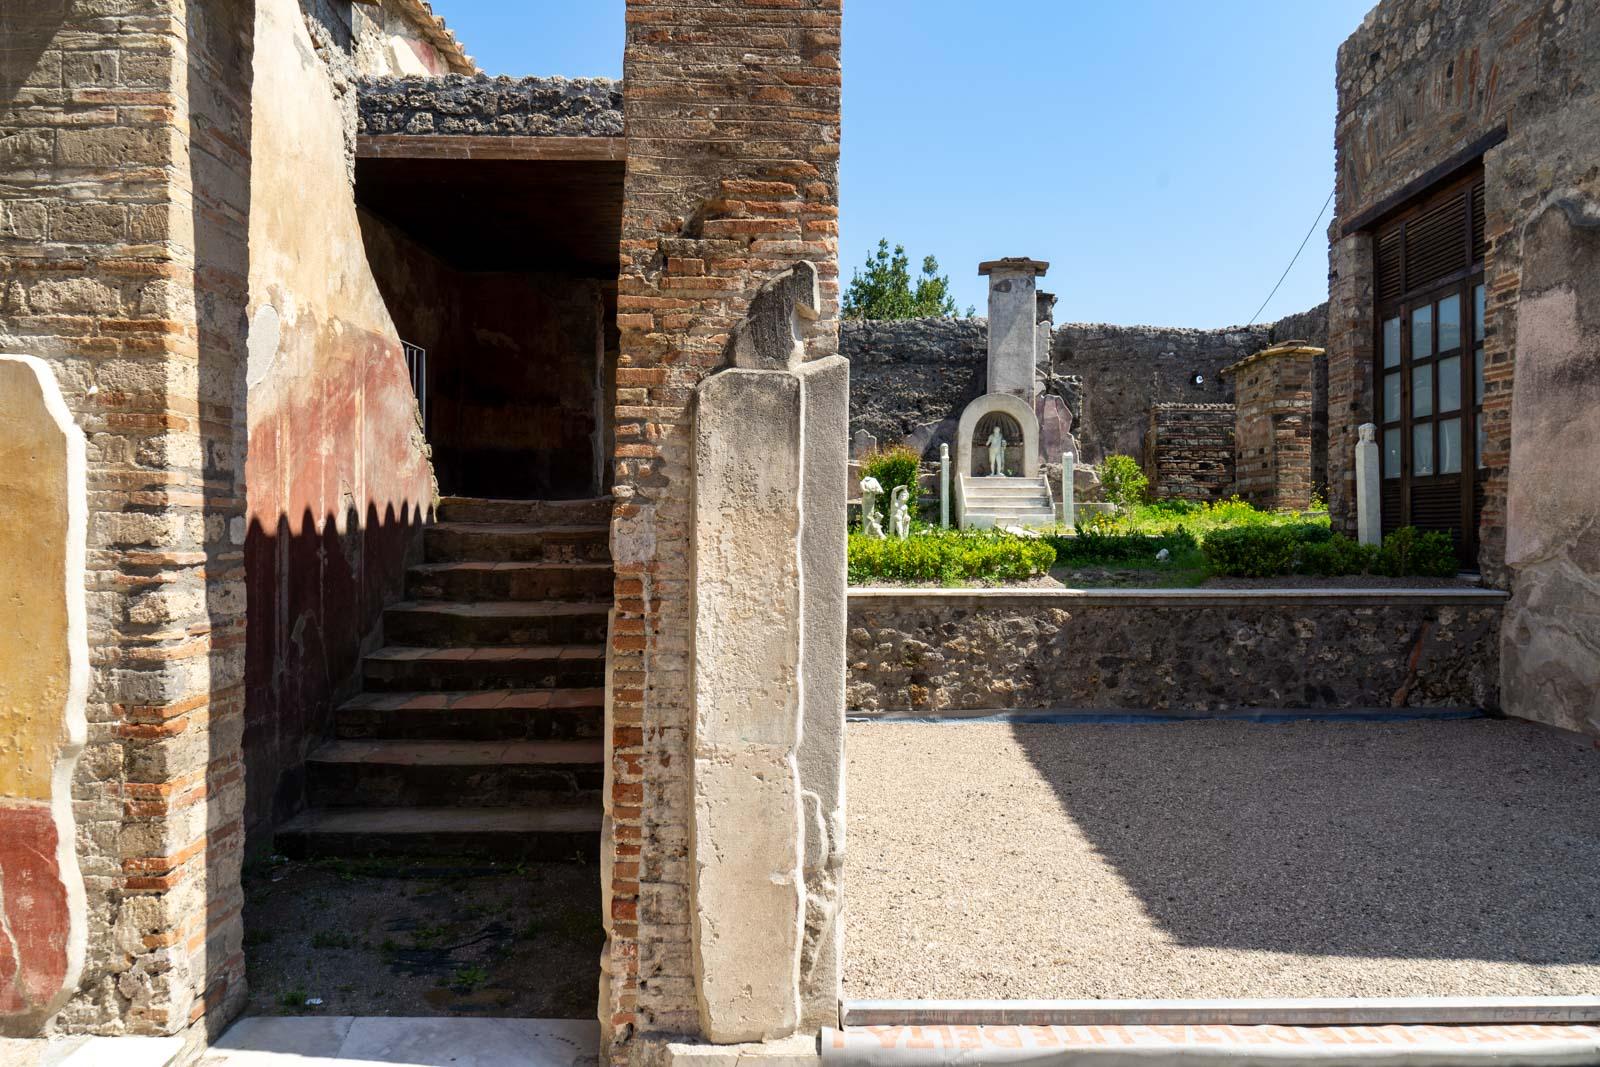 House of Marcus Lucretius in via Stabiana, Pompeii, Italy